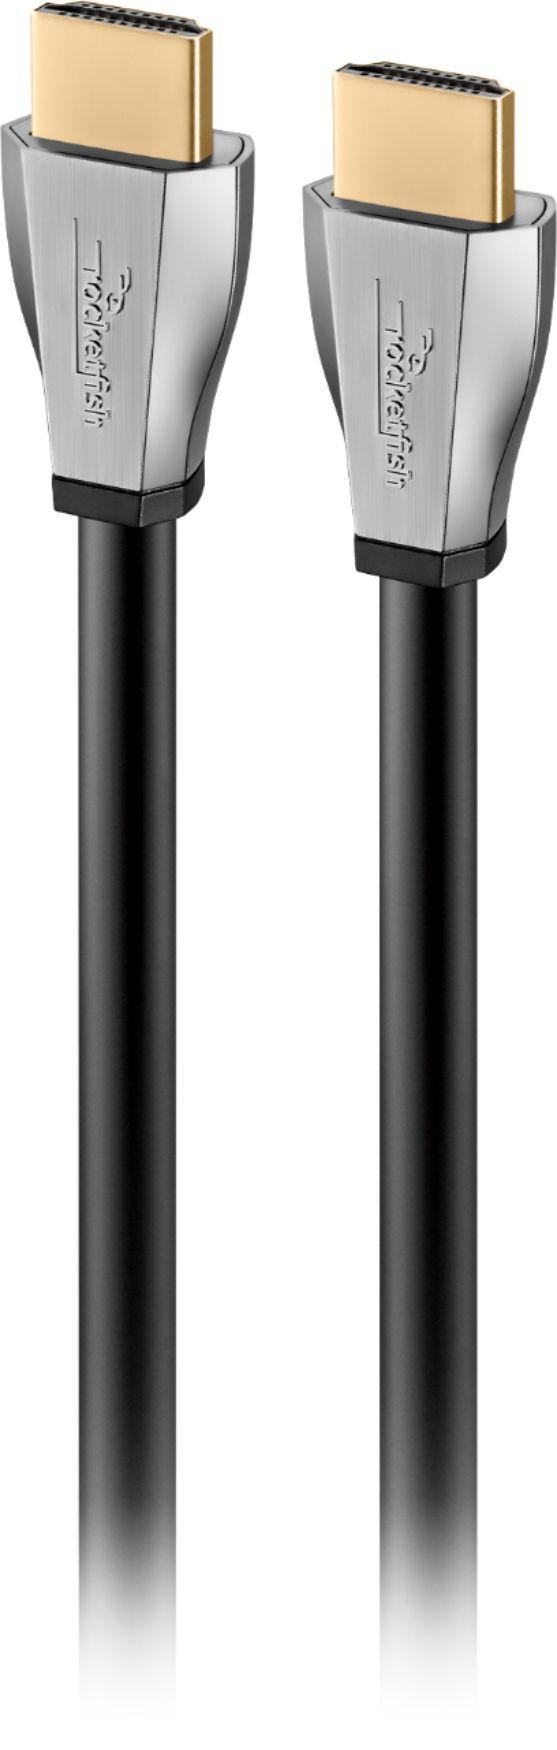 Rocketfish™ - 4' 4K UltraHD/HDR In-Wall Rated HDMI Cable - Black